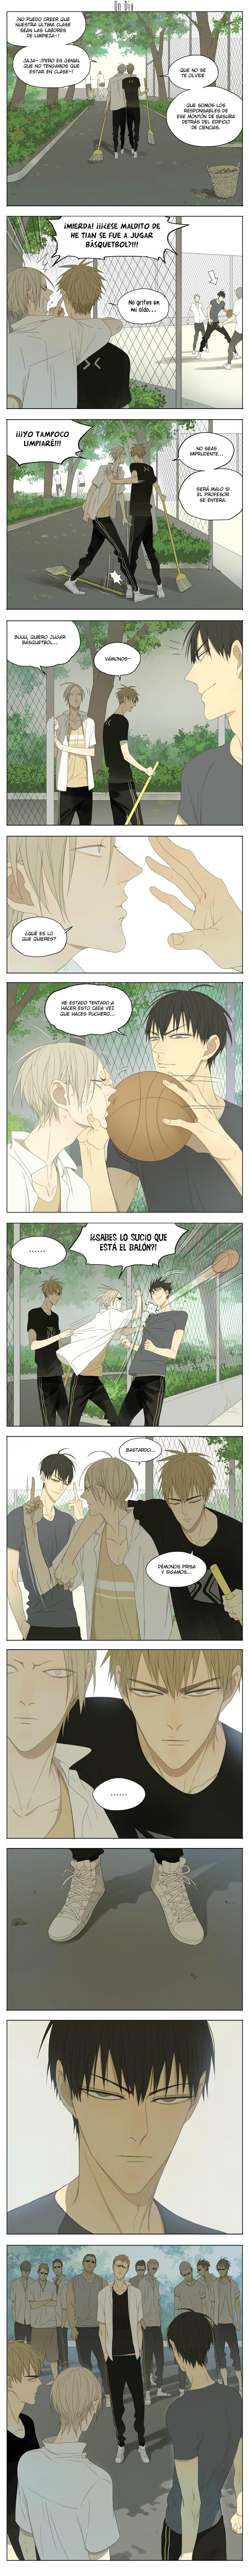 http://c5.ninemanga.com/es_manga/7/15943/430531/3ee99048971f0284e4c36e56c2502977.jpg Page 9